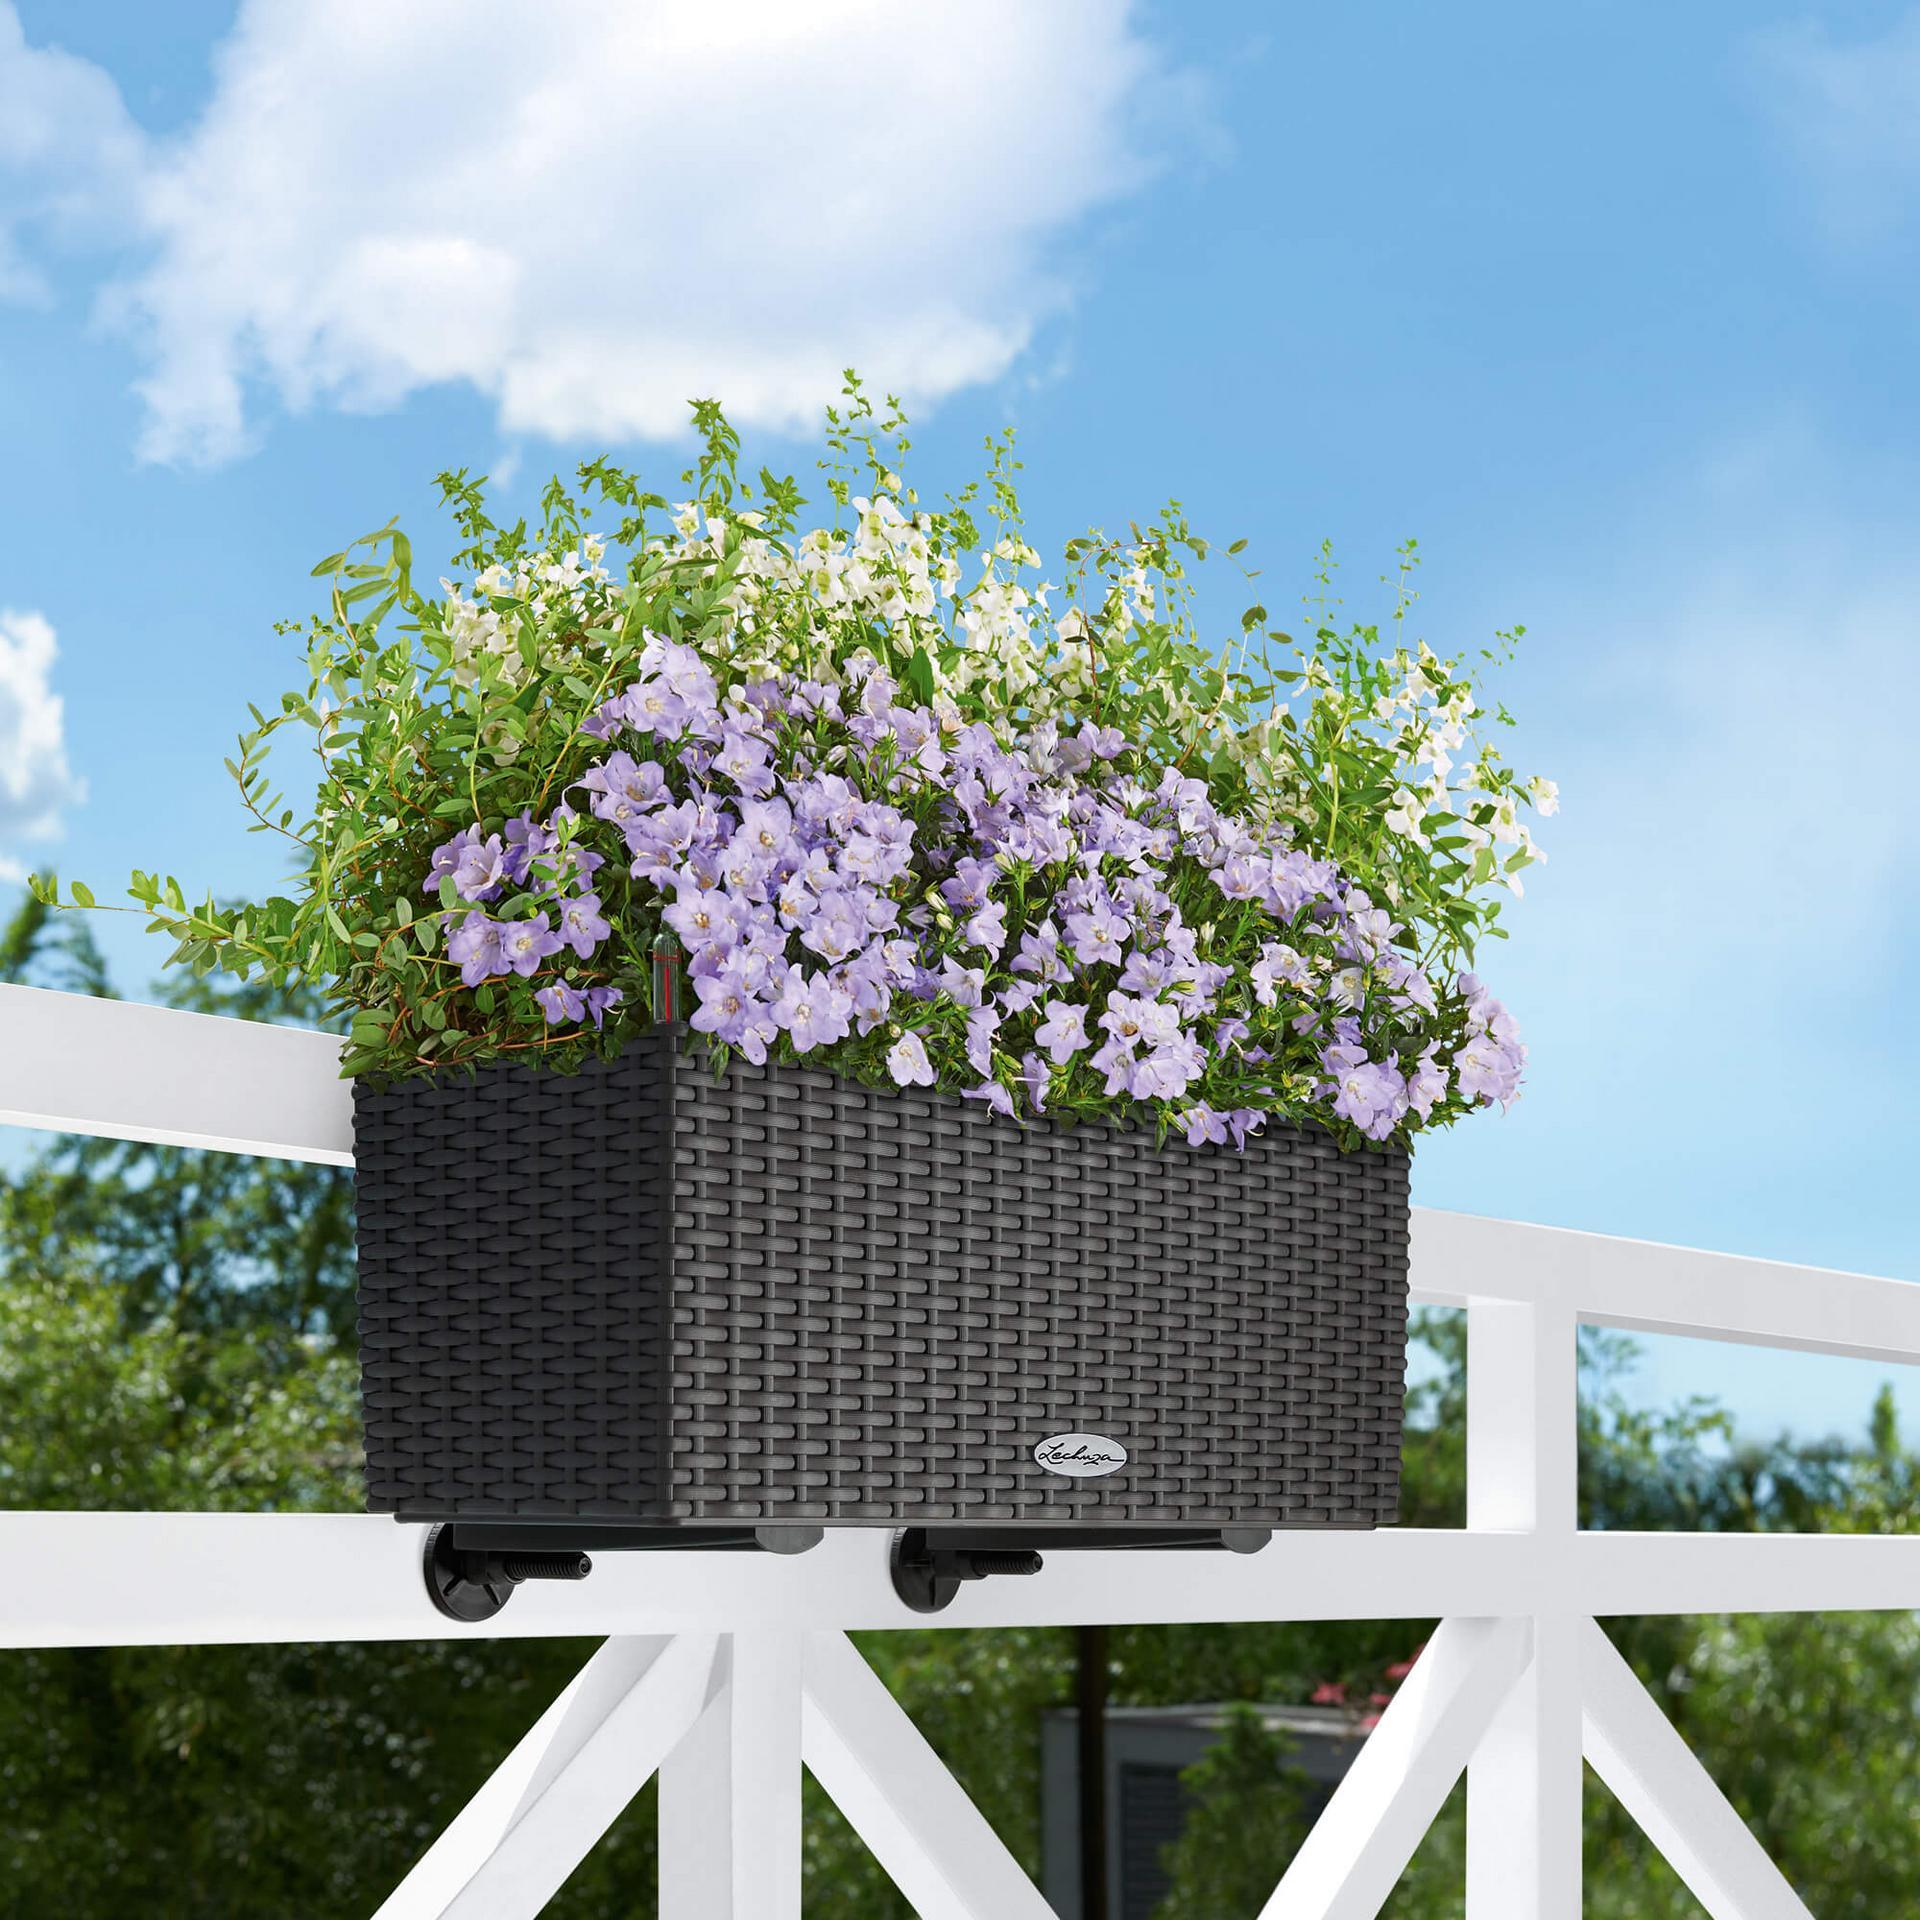 le_balkonkastenhalter-balconera_product_addi_05